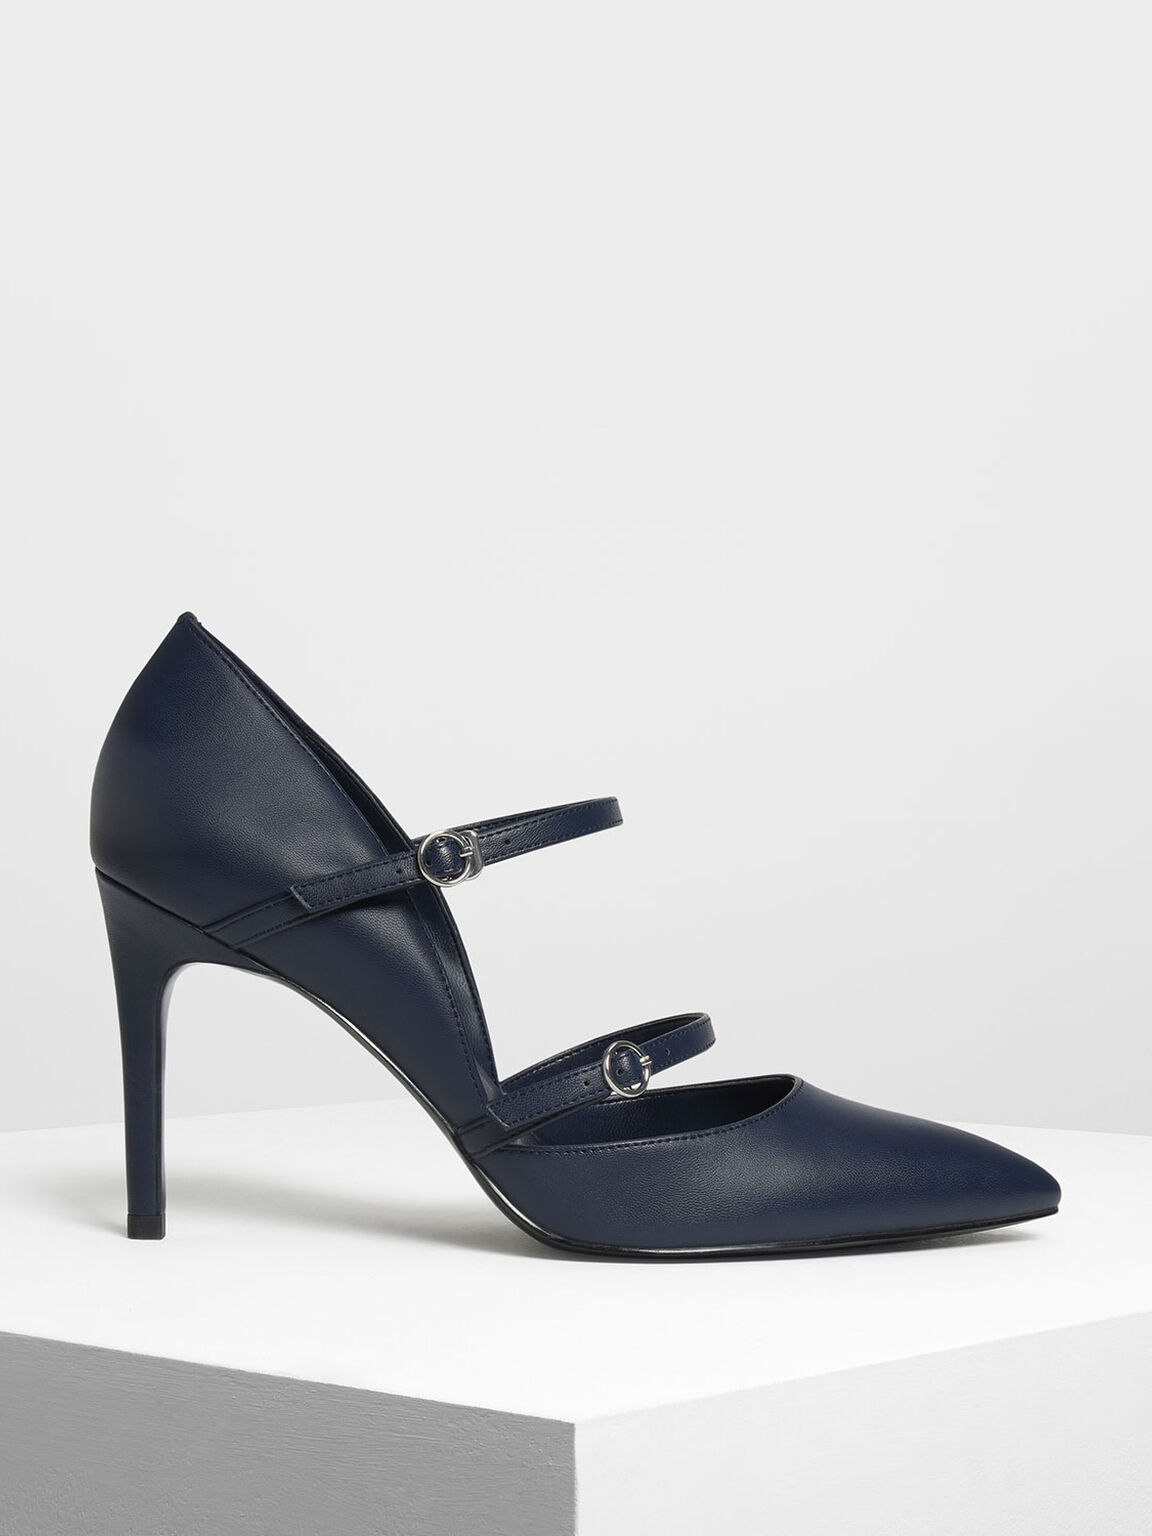 Double Strap Mary Jane Heels, Dark Blue, hi-res